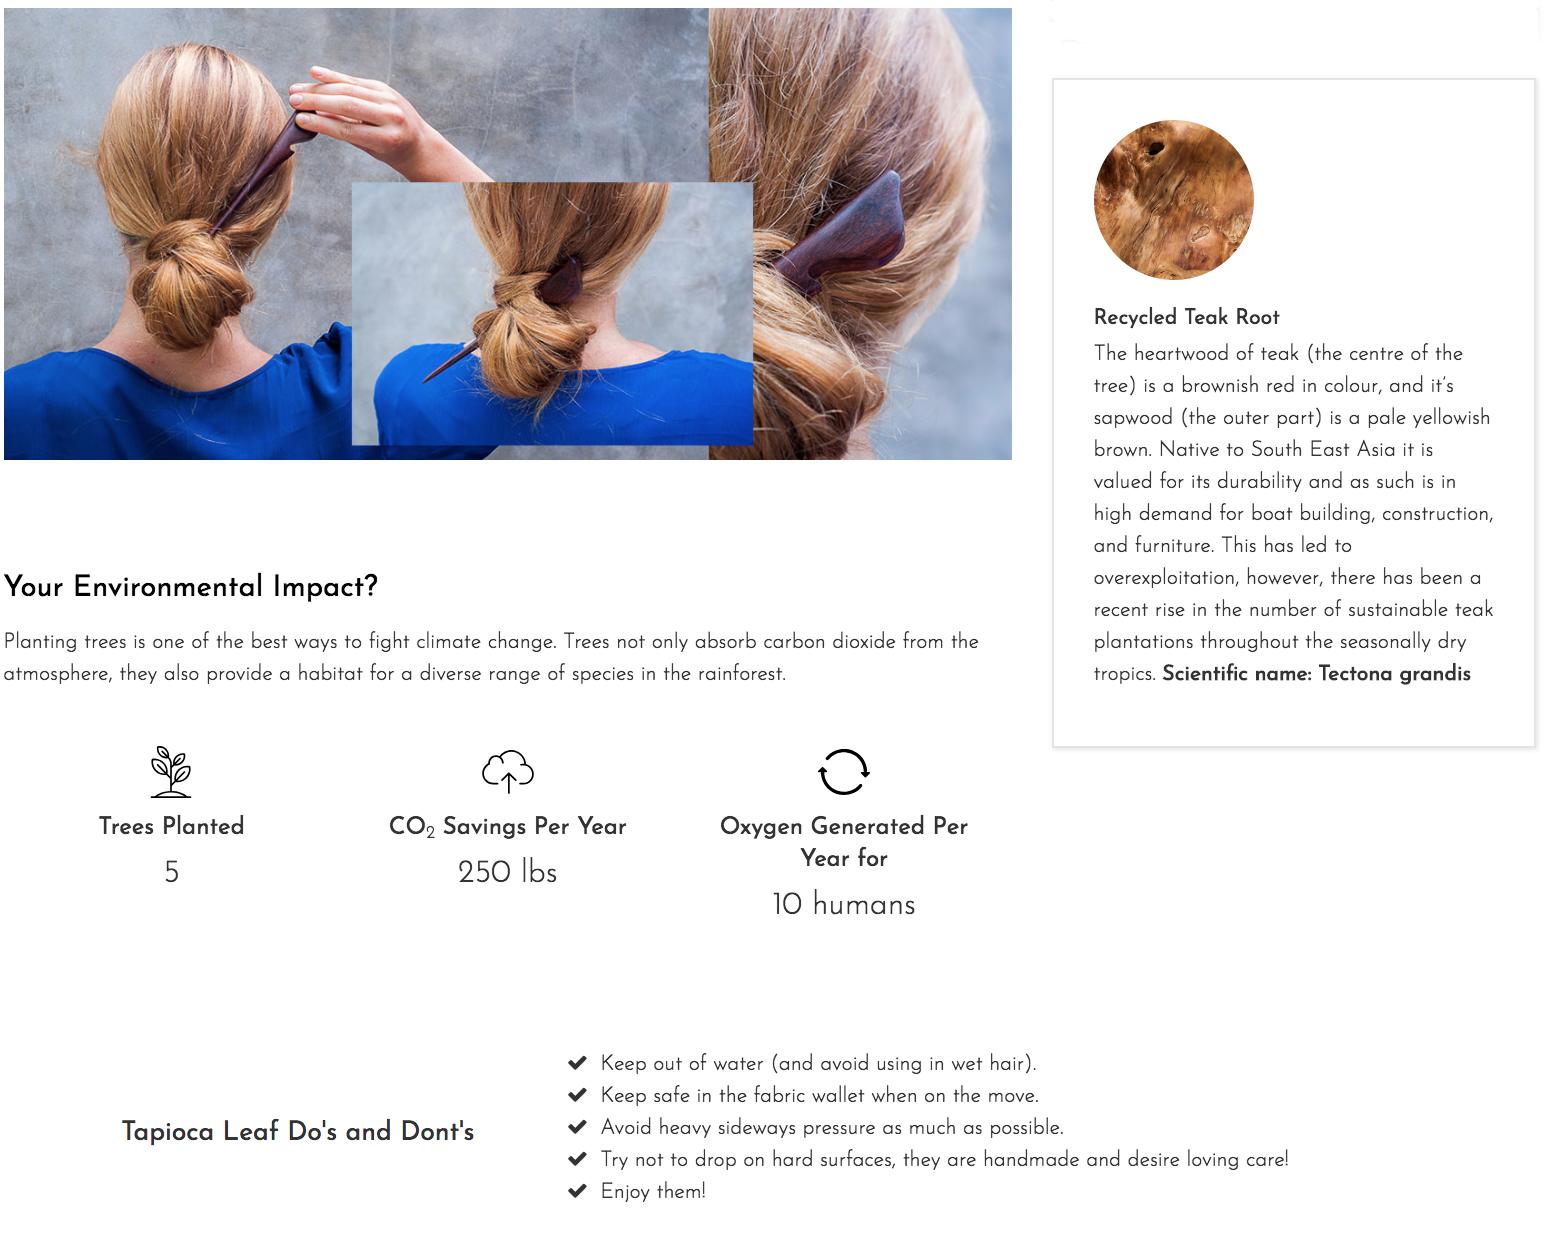 About the Tapioca Hair Stick Environmental Impact